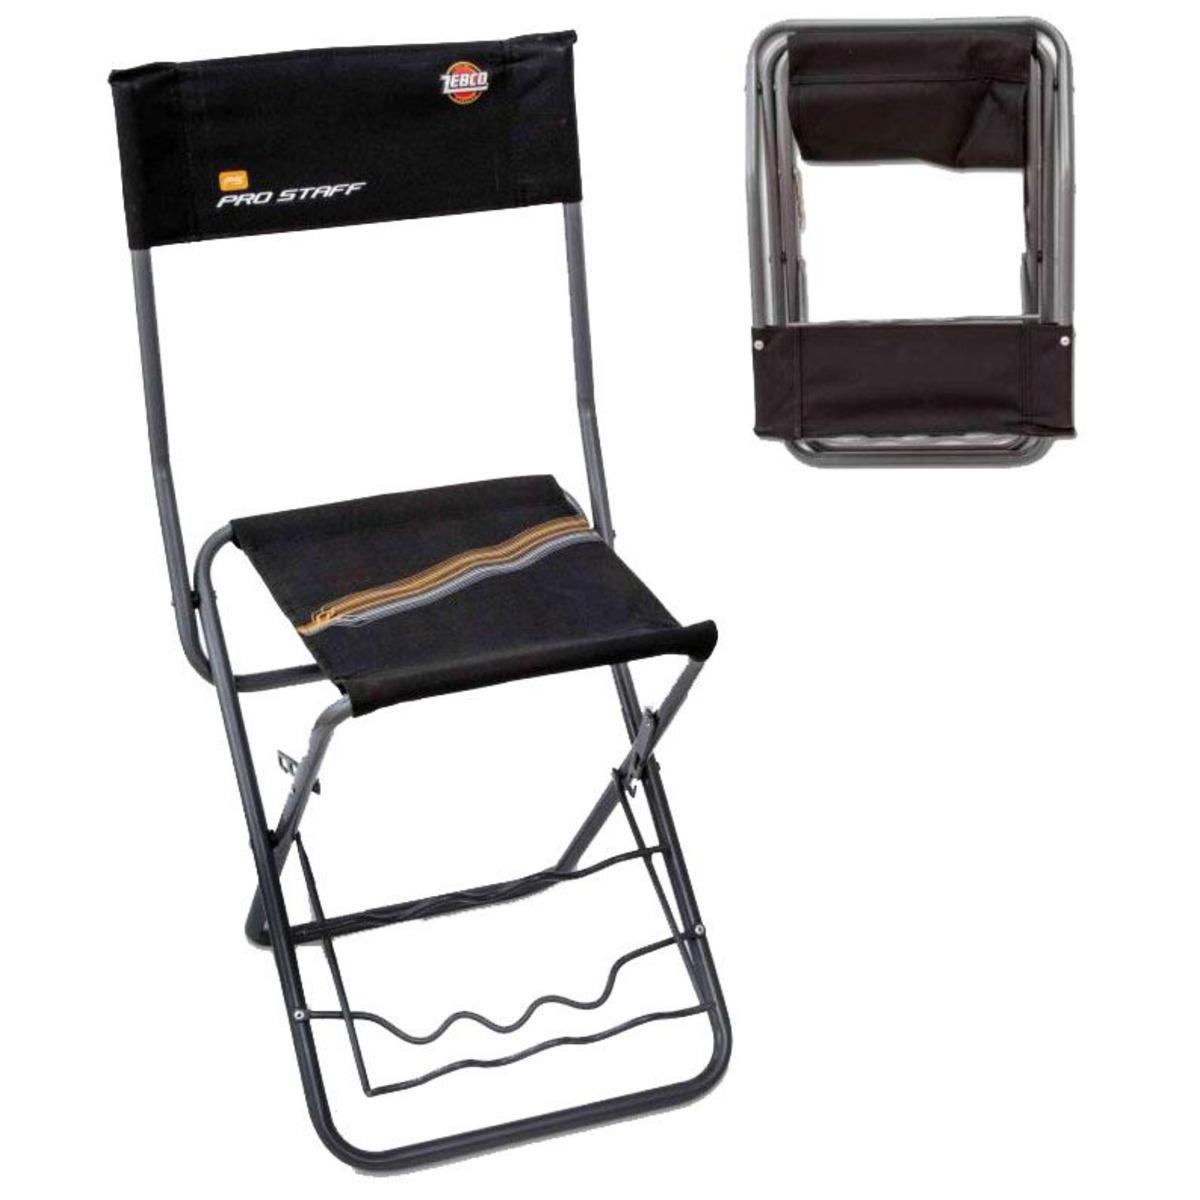 Zebco Pro Staff RH Chair - 26x32x73 cm